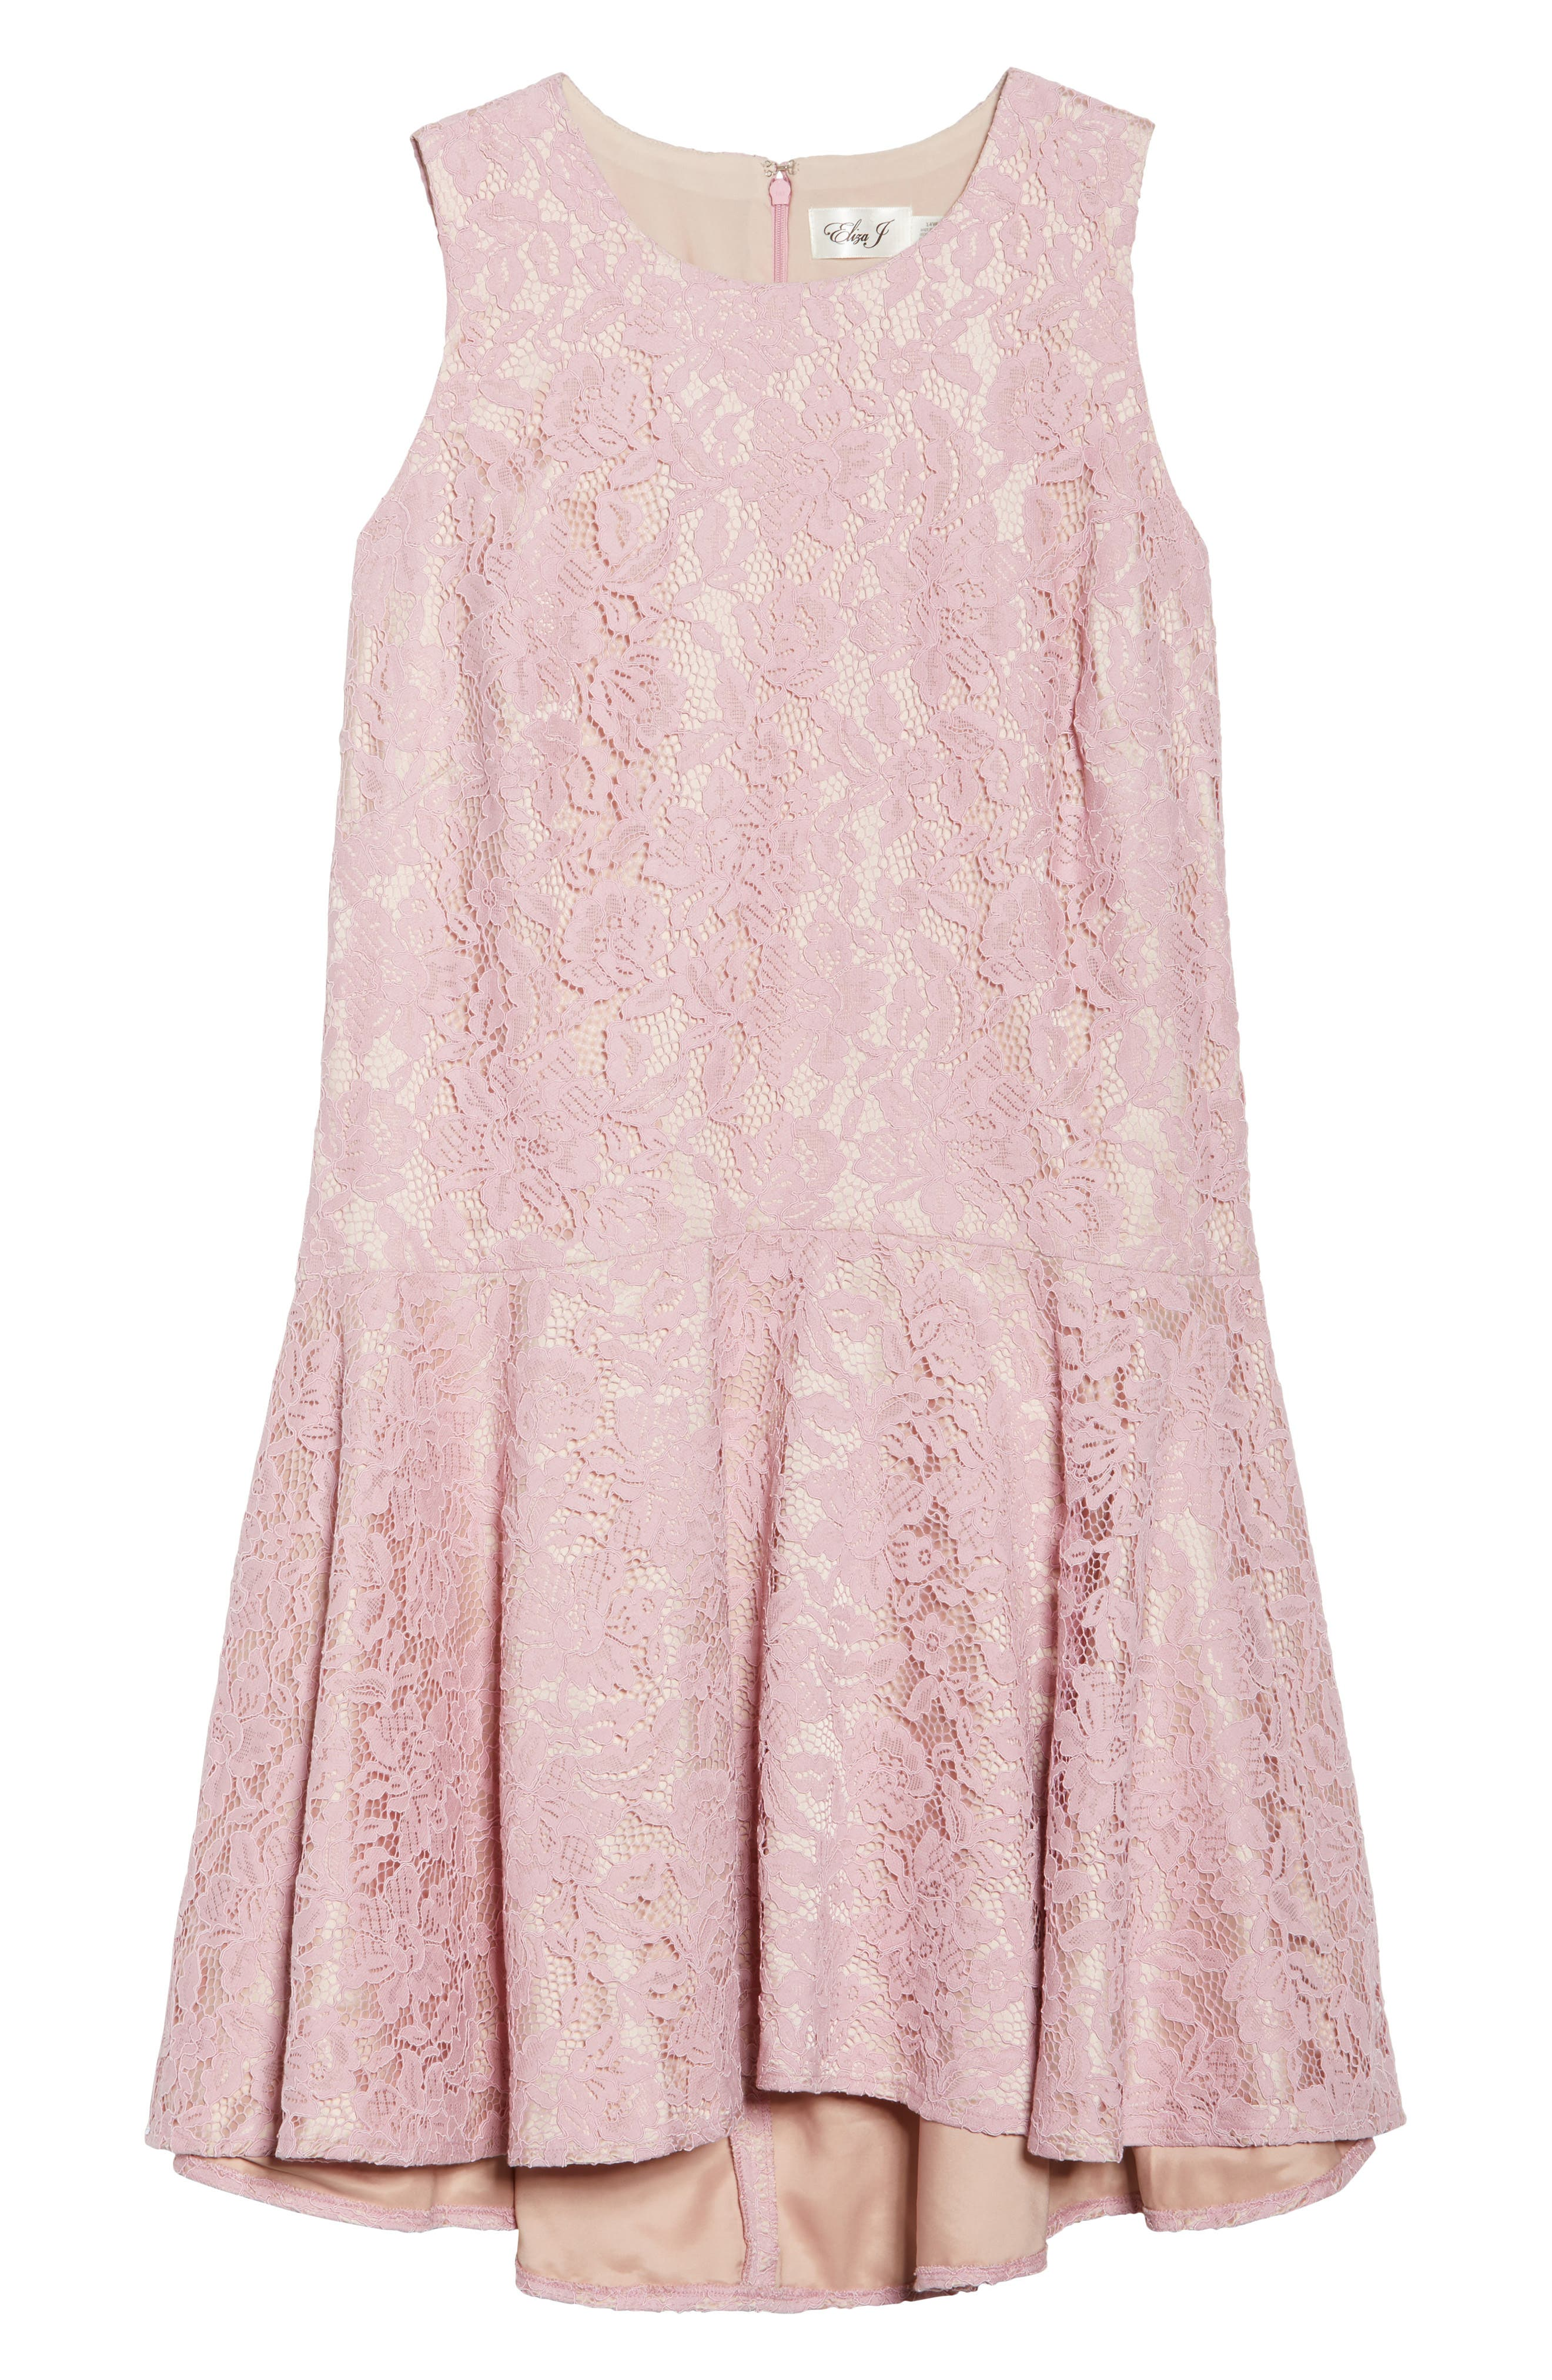 Lace Sleeveless Drop Waist Dress,                             Alternate thumbnail 6, color,                             684